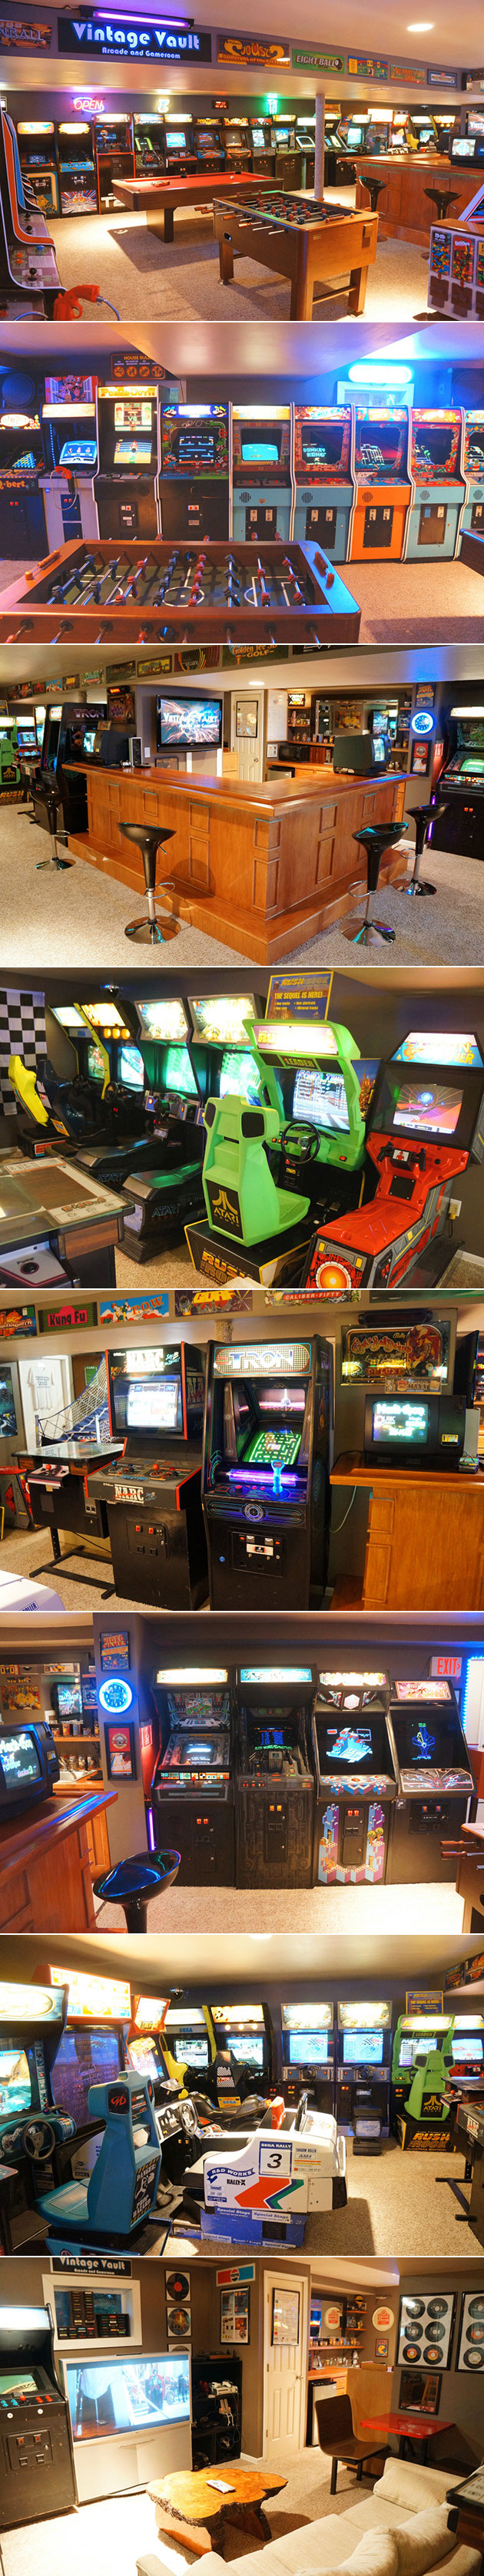 Vintage arcade basement